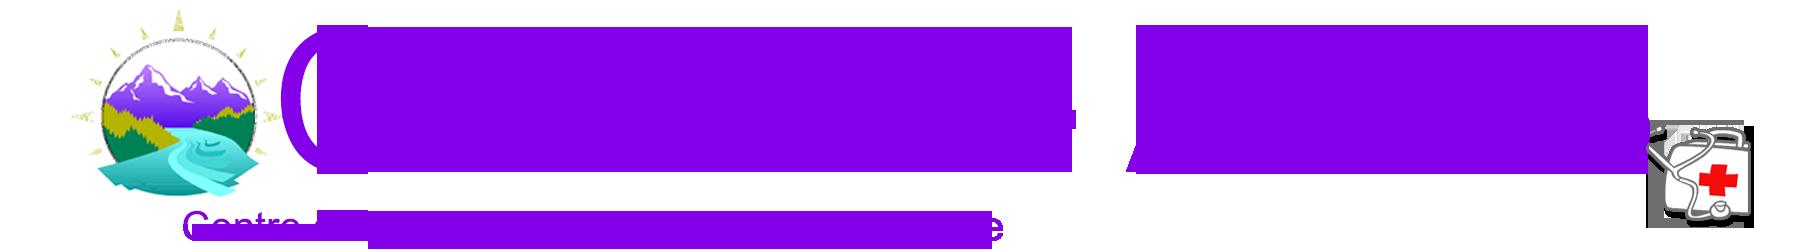 APSS-CEPRE